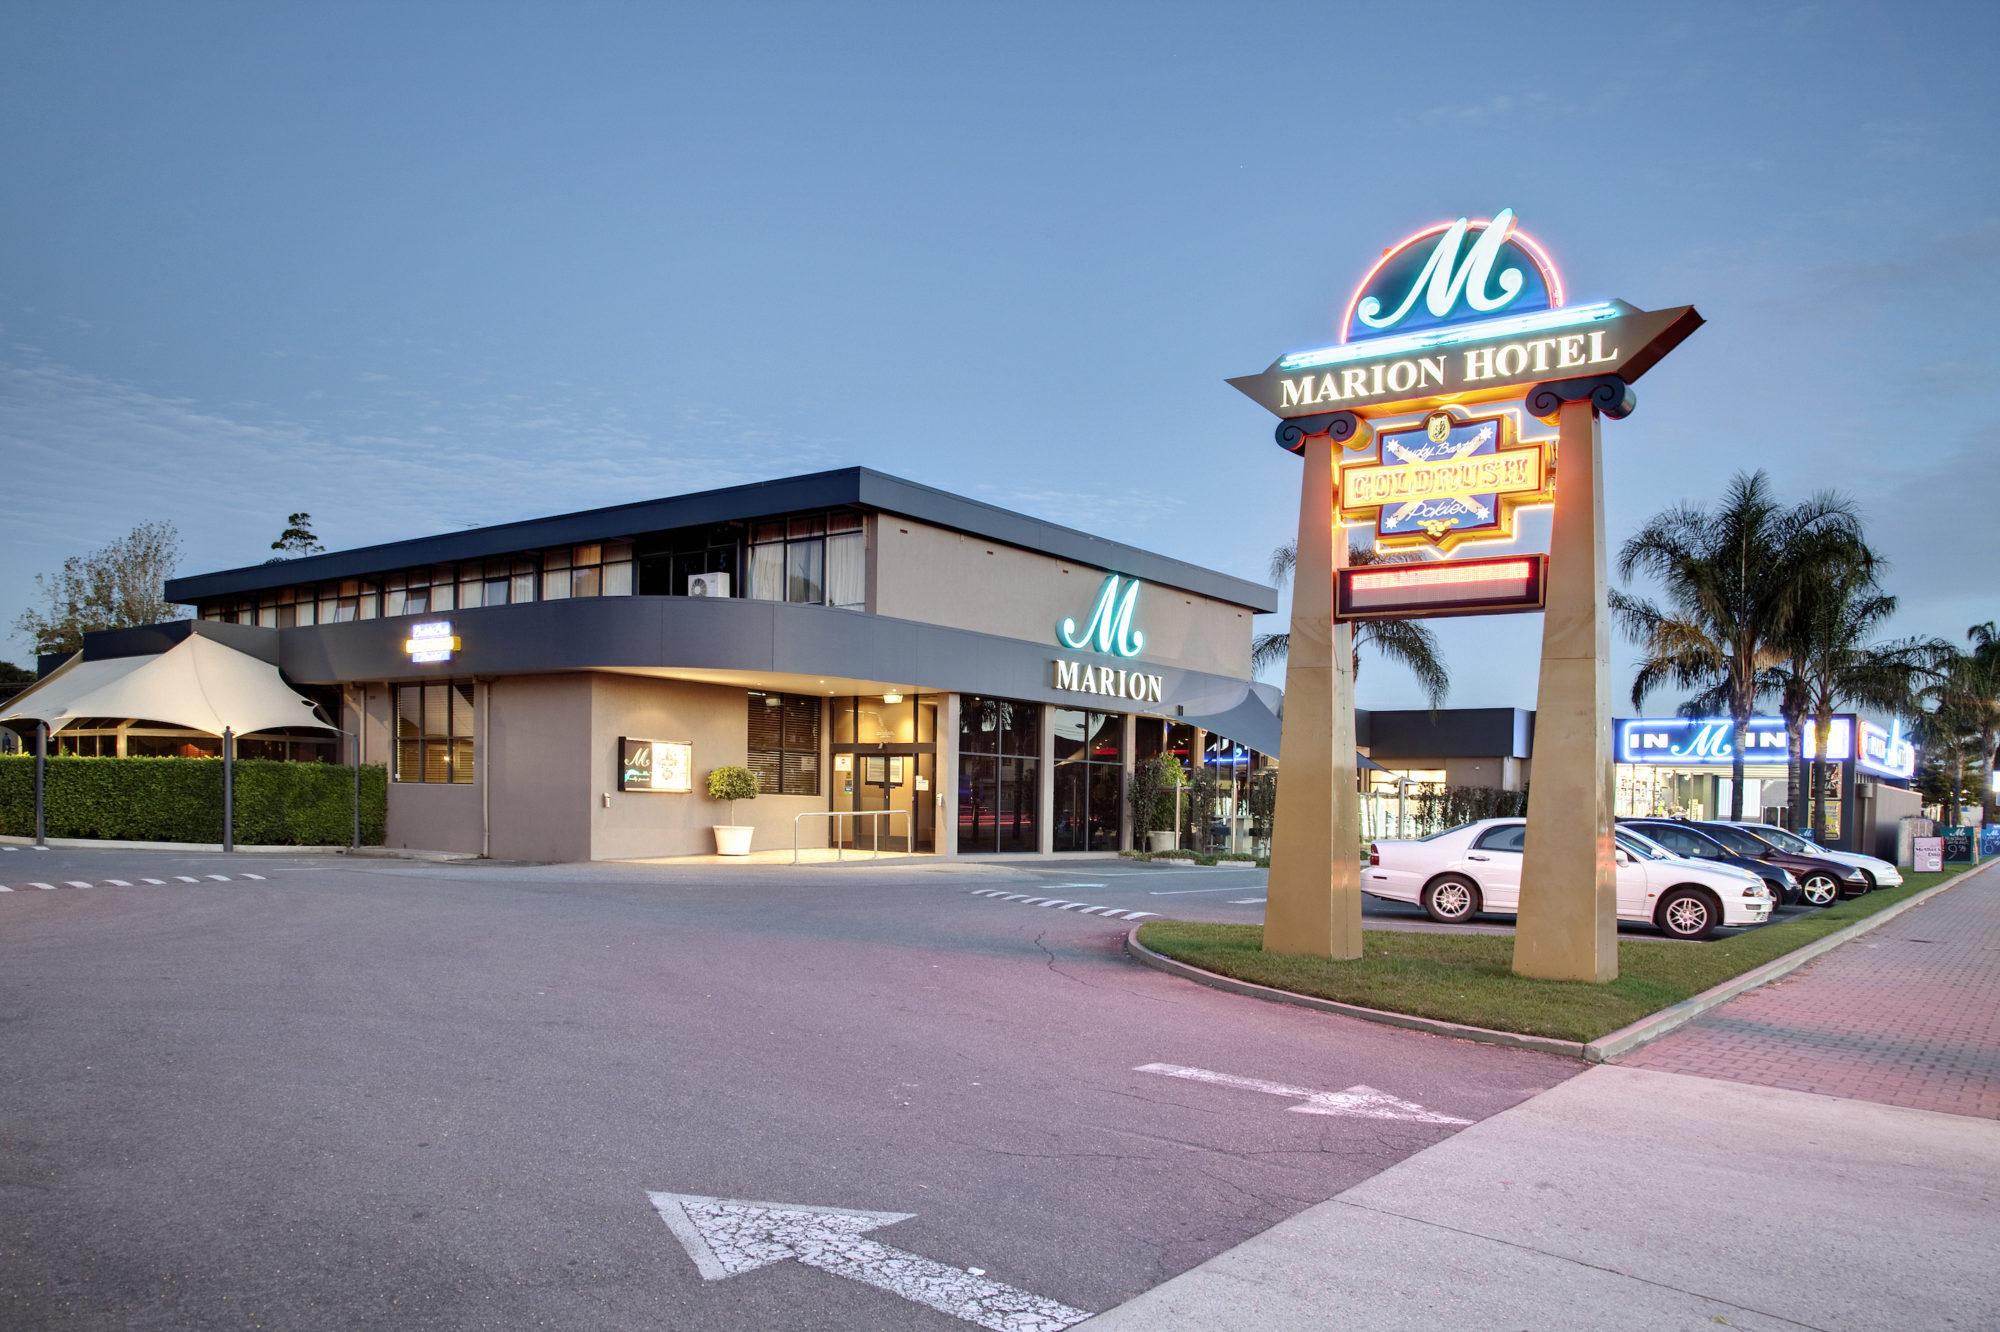 Marion-hotel-adelaide-accomodation-exterior